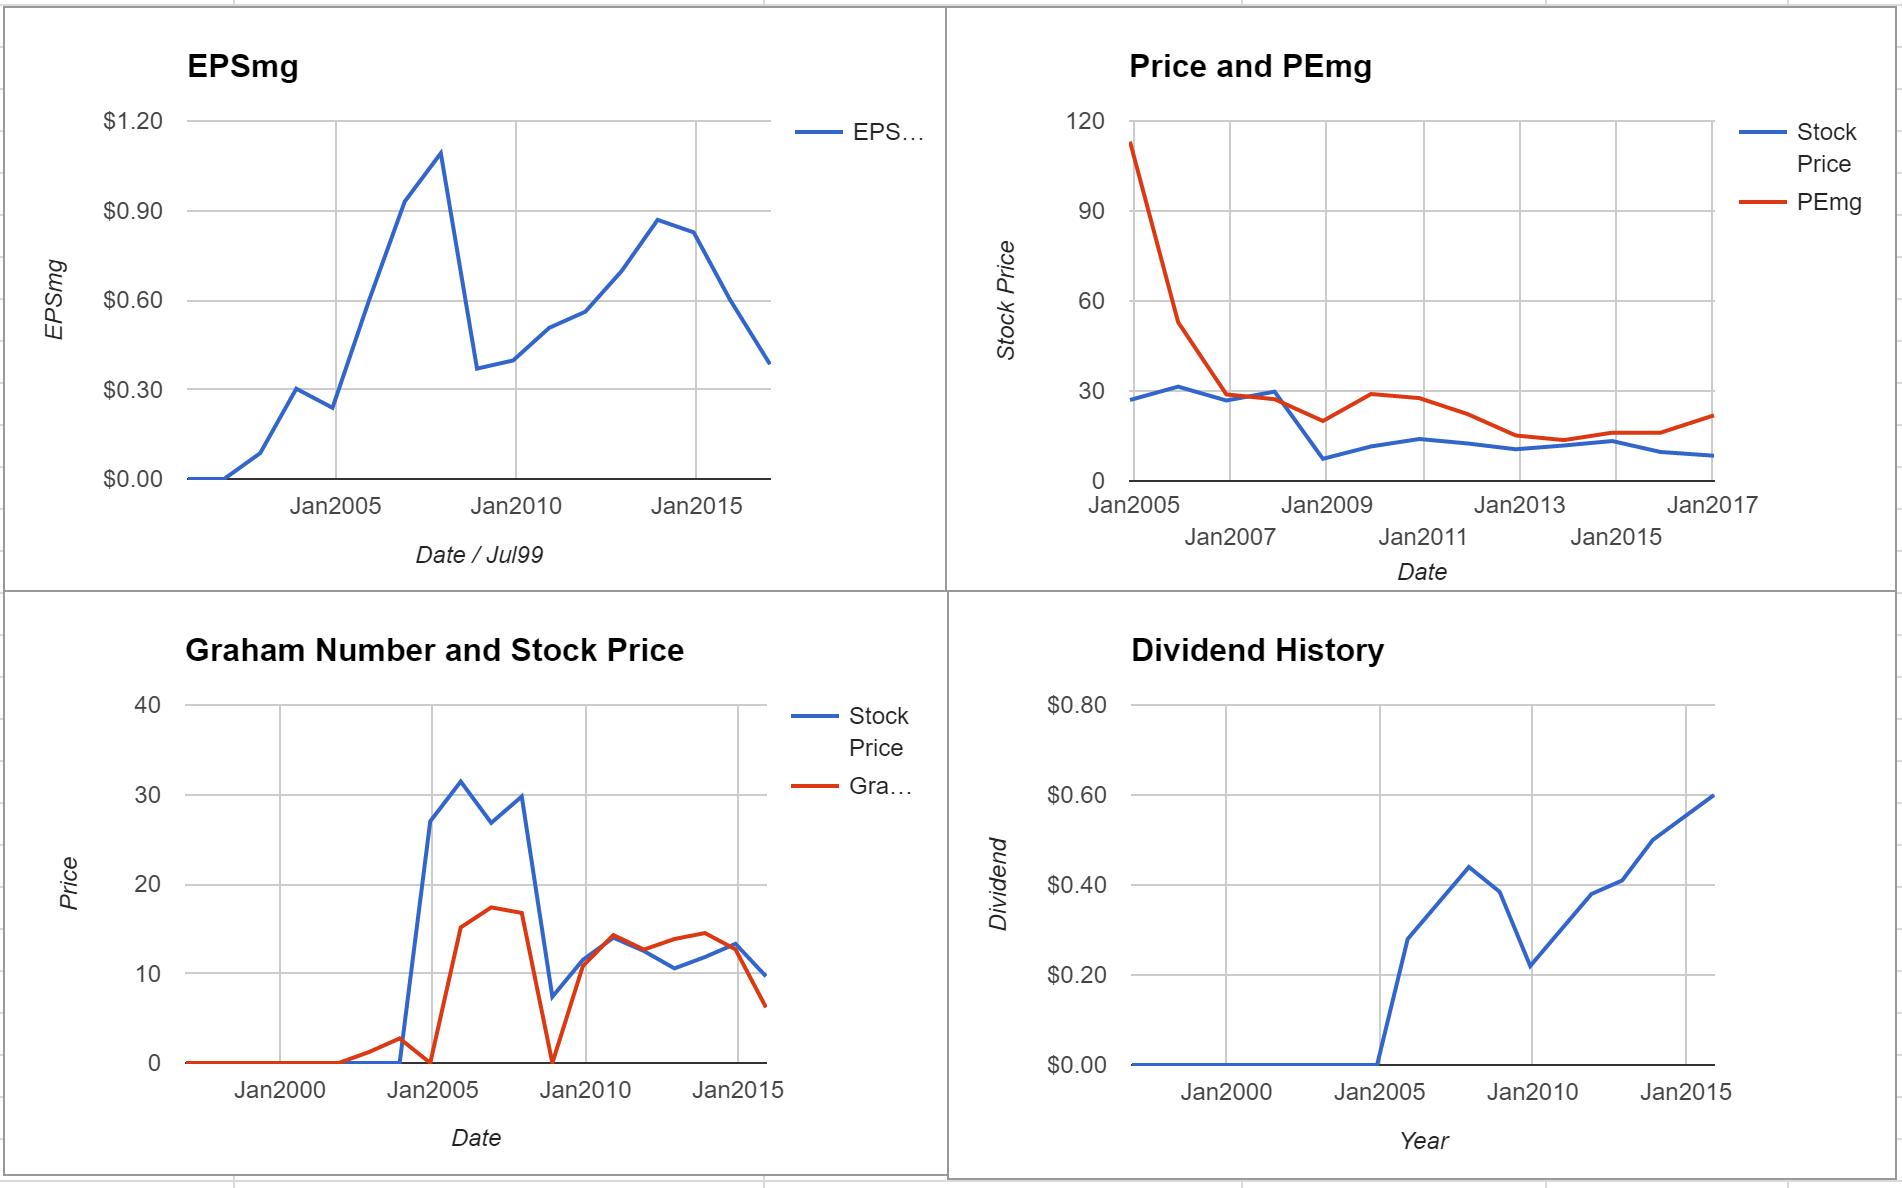 Calamos Asset Management Inc Valuation – Initial Coverage $CLMS